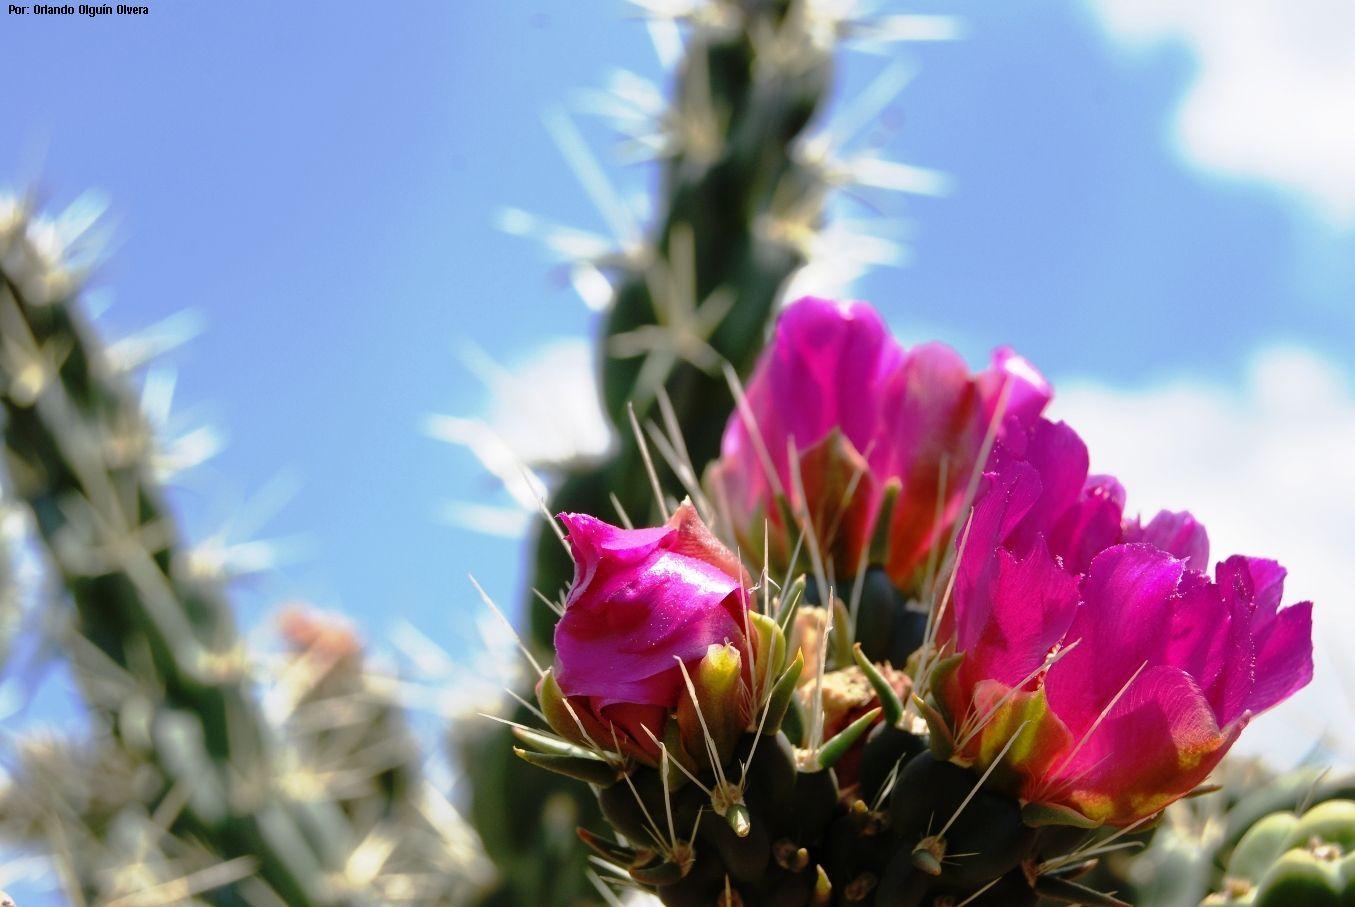 flores cactáceas - Buscar con Google